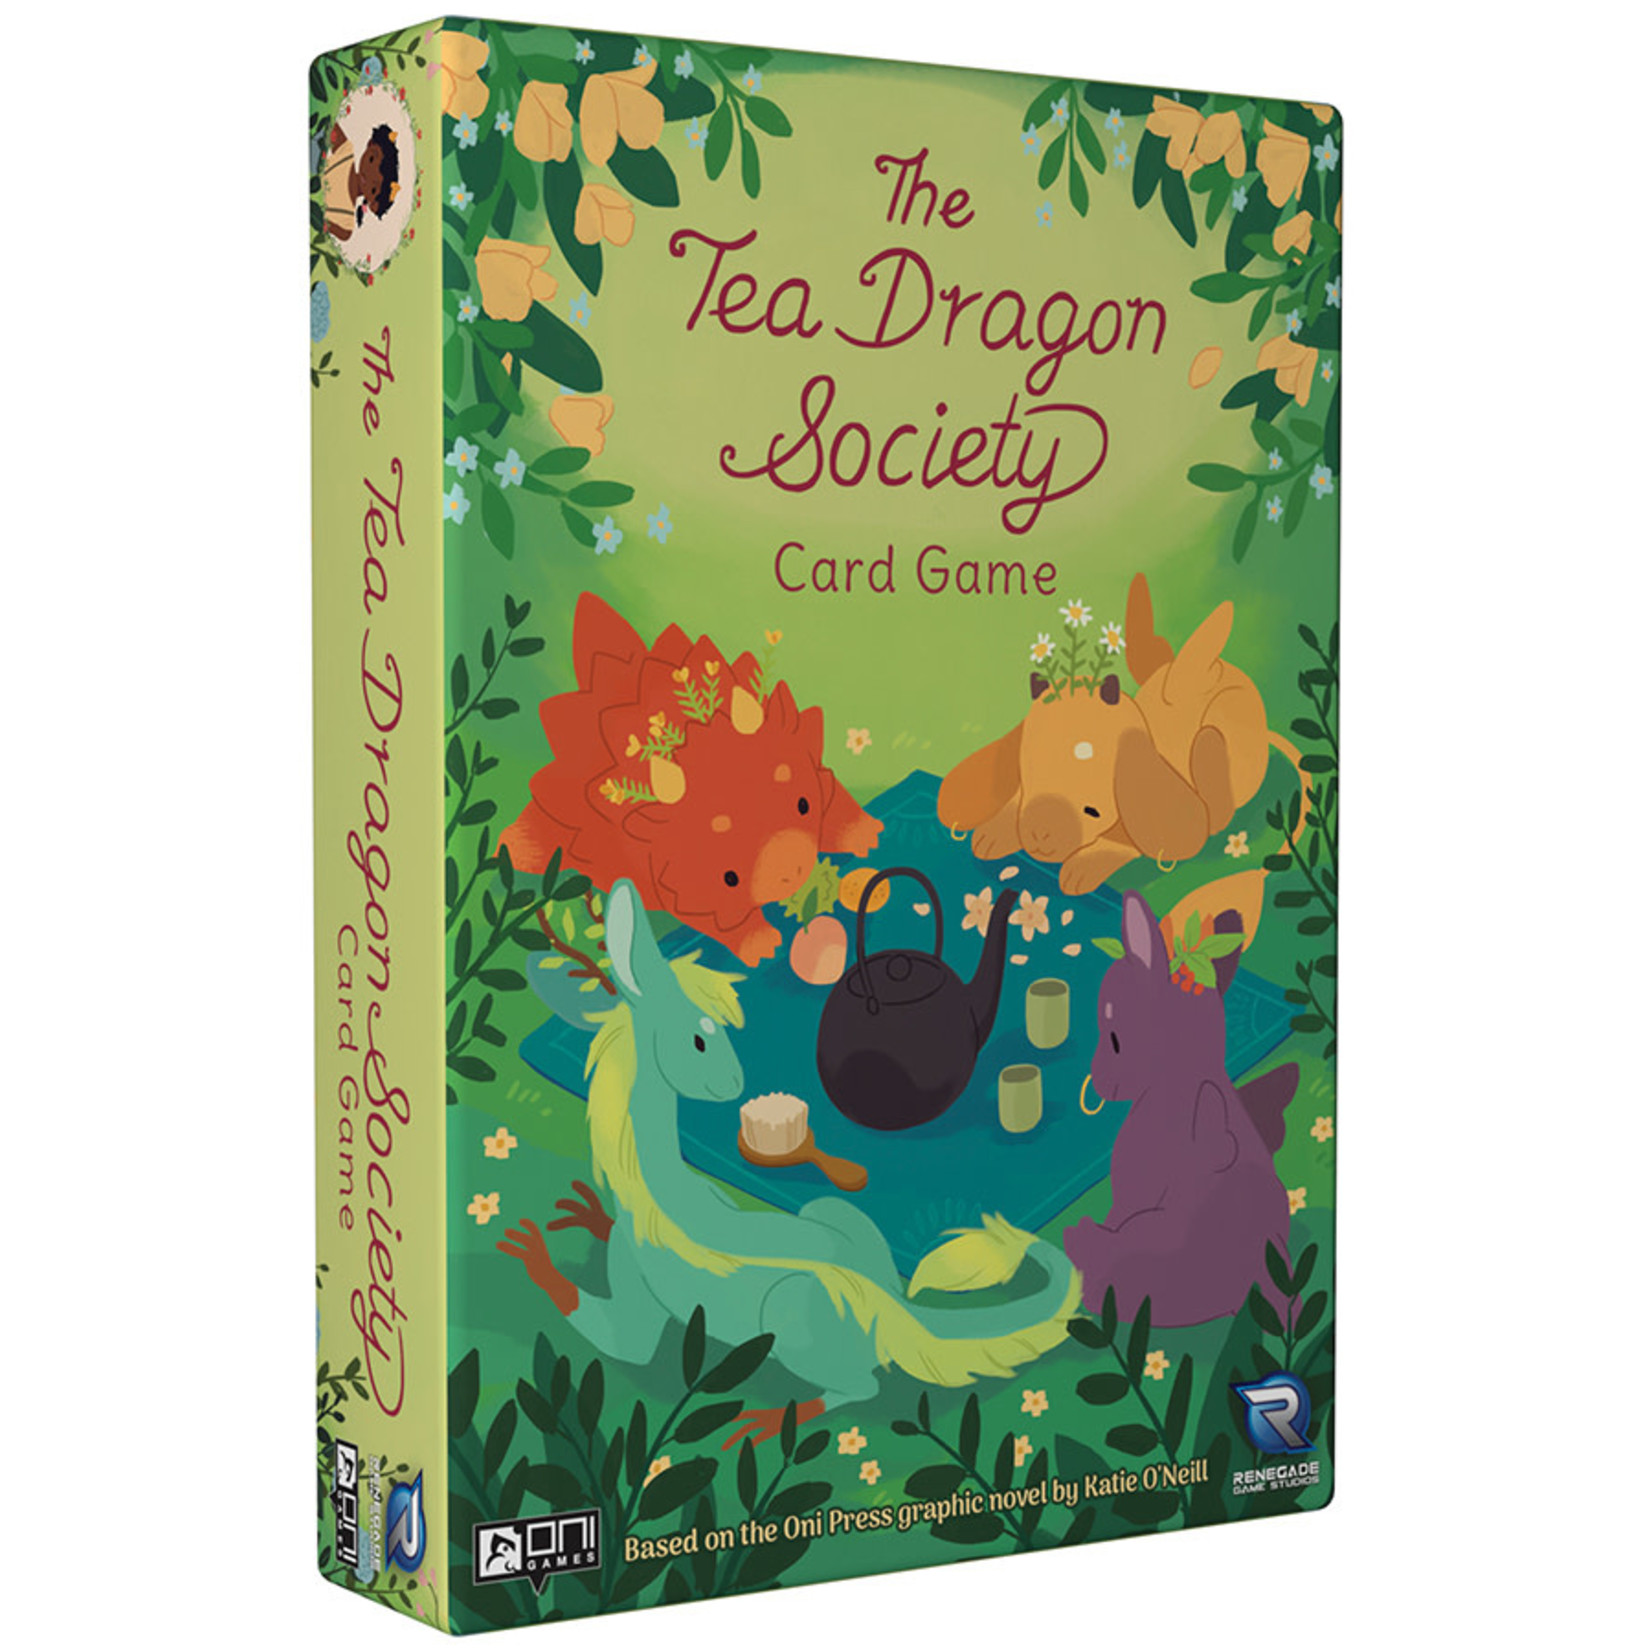 The Tea Dragon Society Card Game